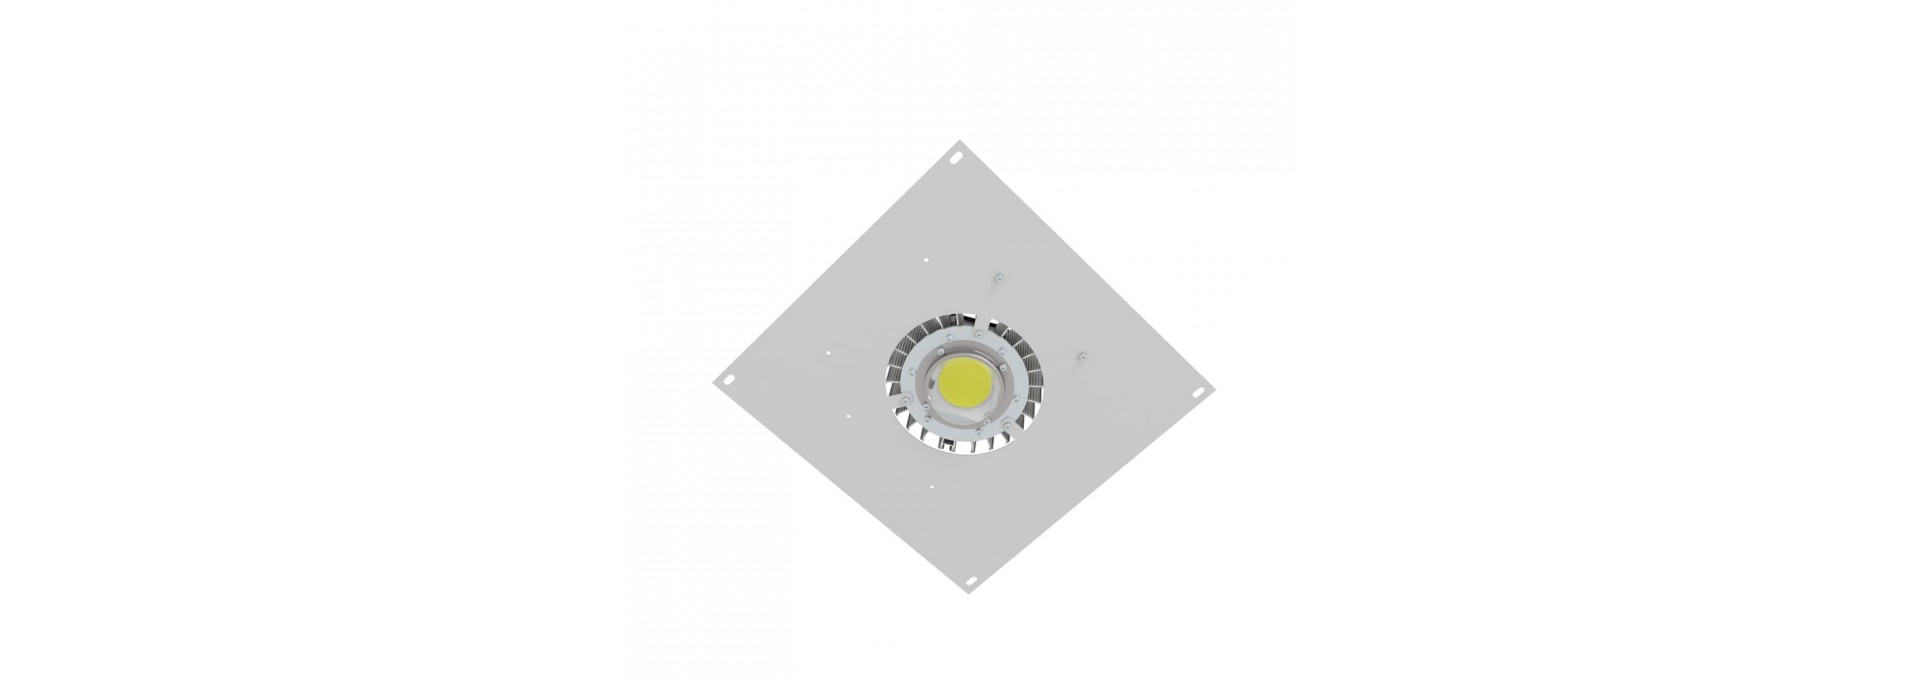 АЗС 50 Эко 6500К 120°